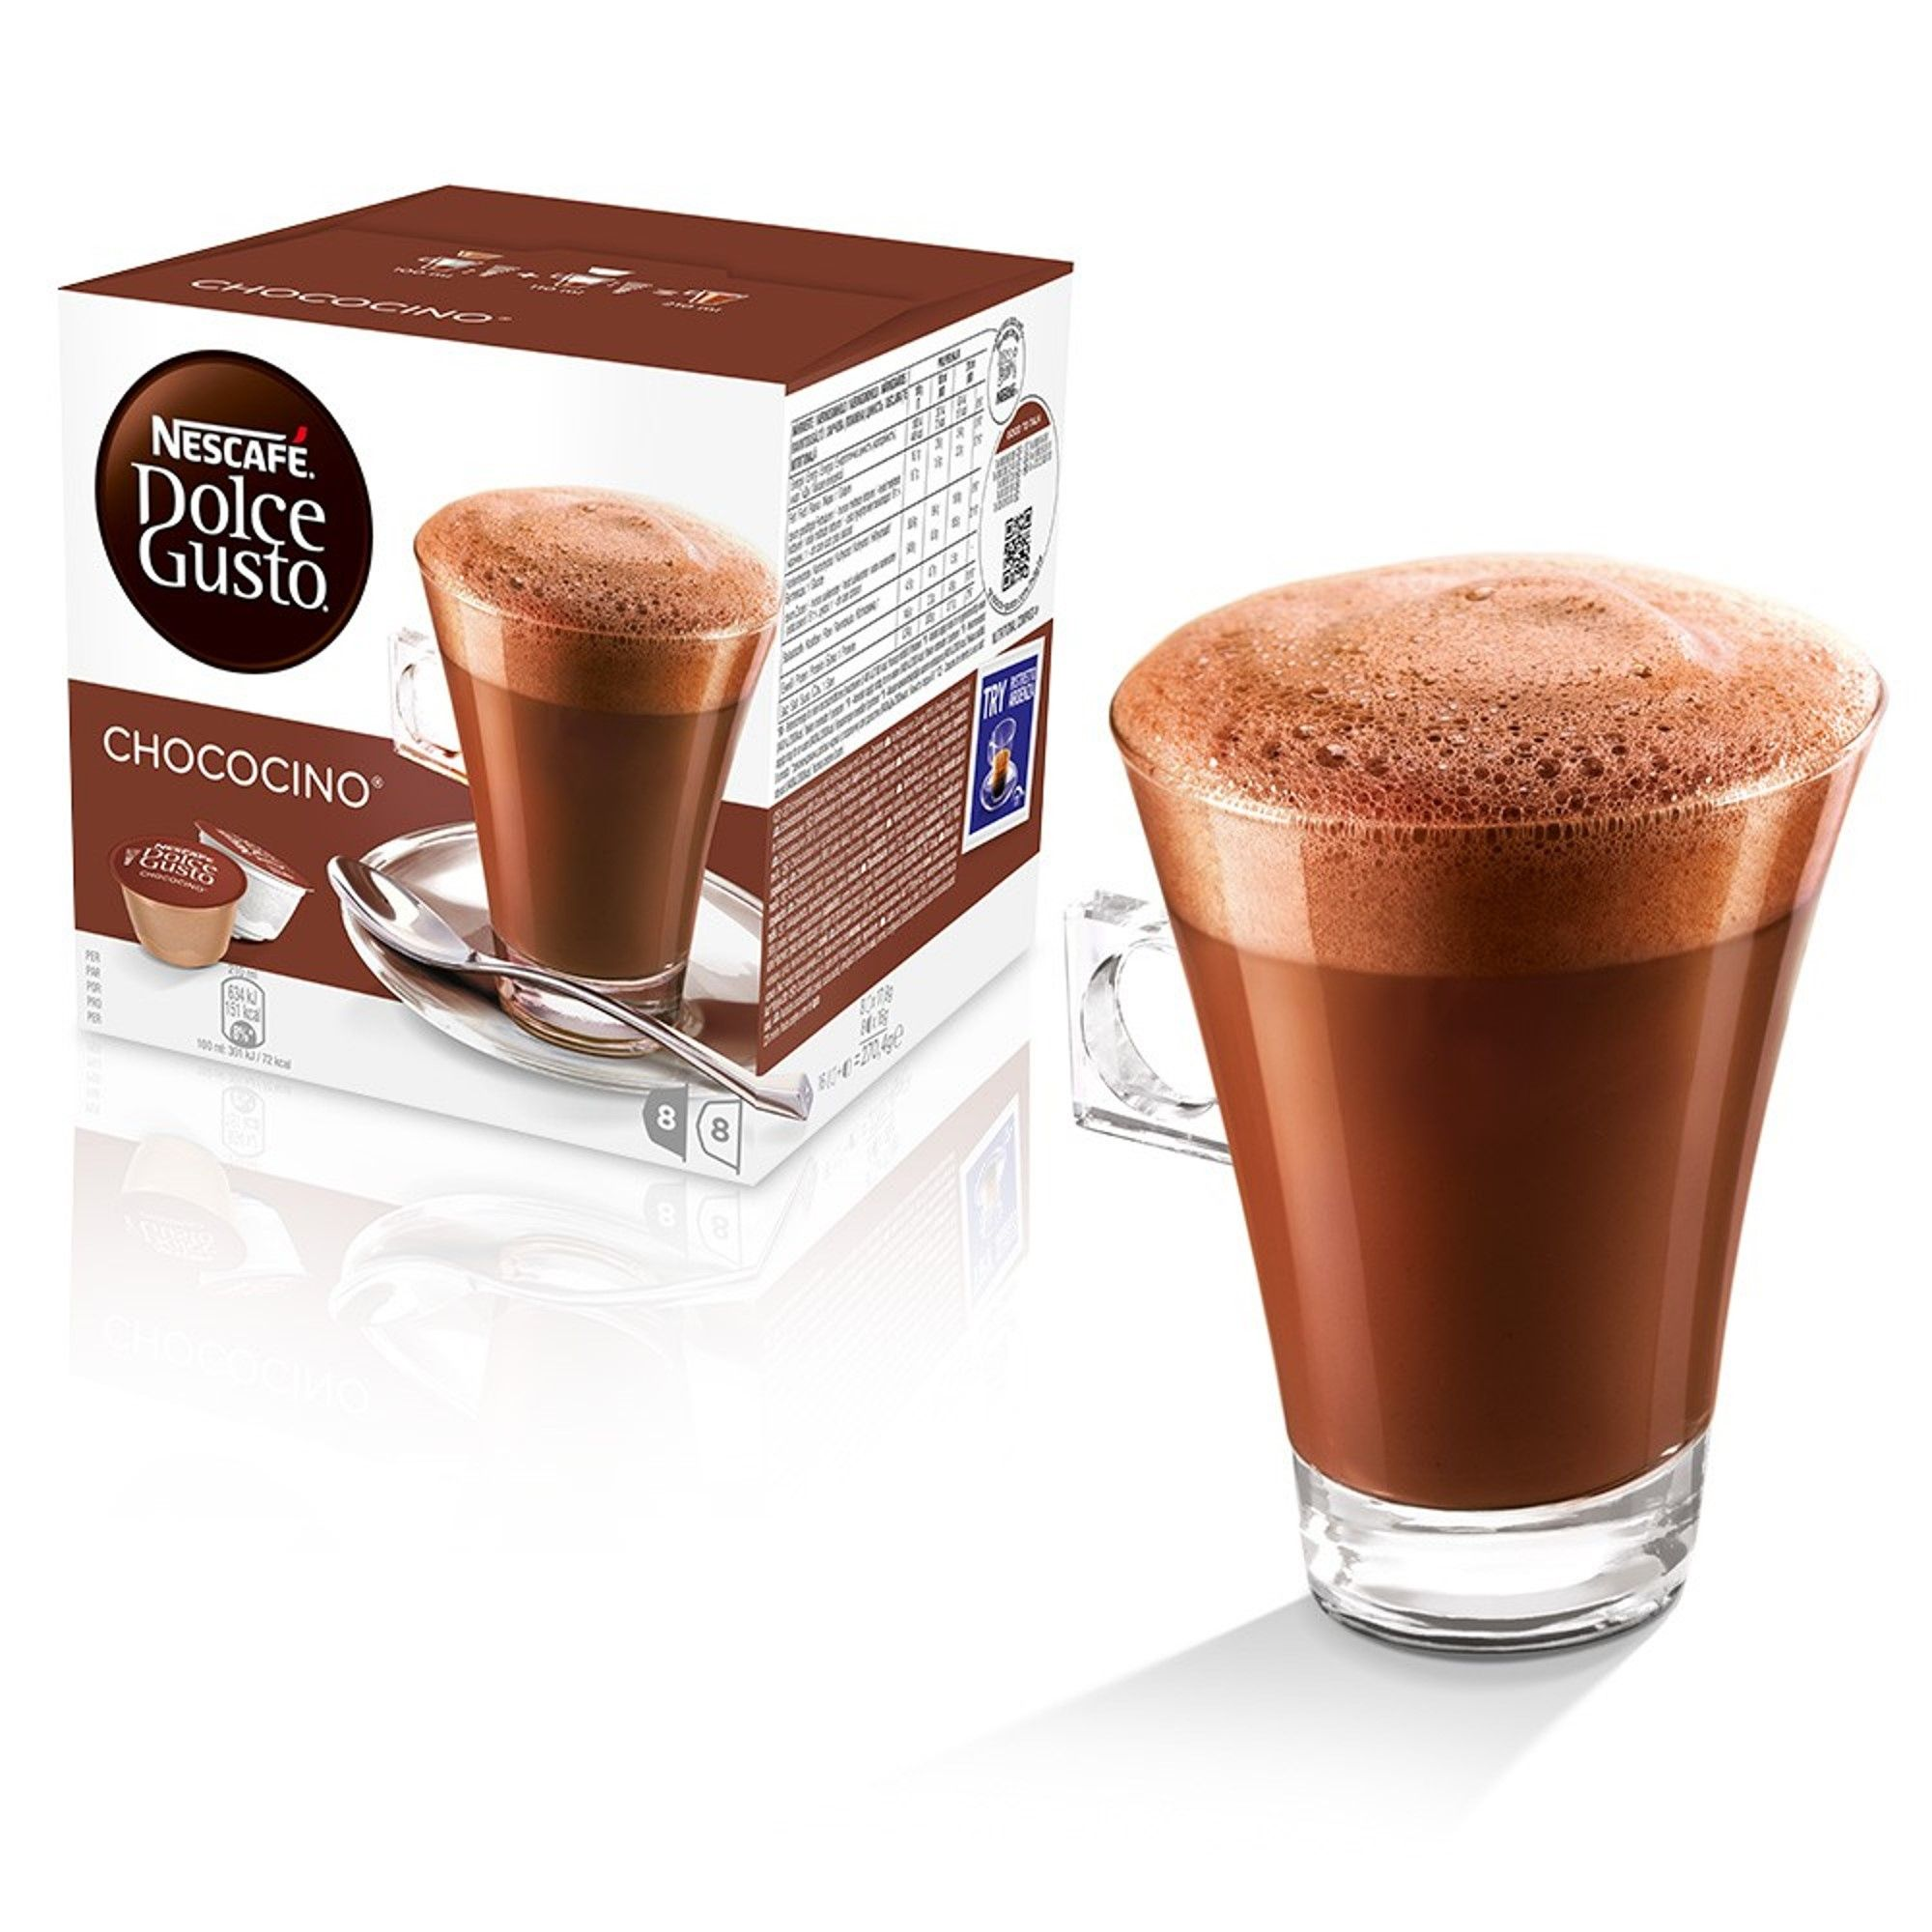 Nescafe Dolce Gusto Chococino Hot Chocolate Coffee Pods